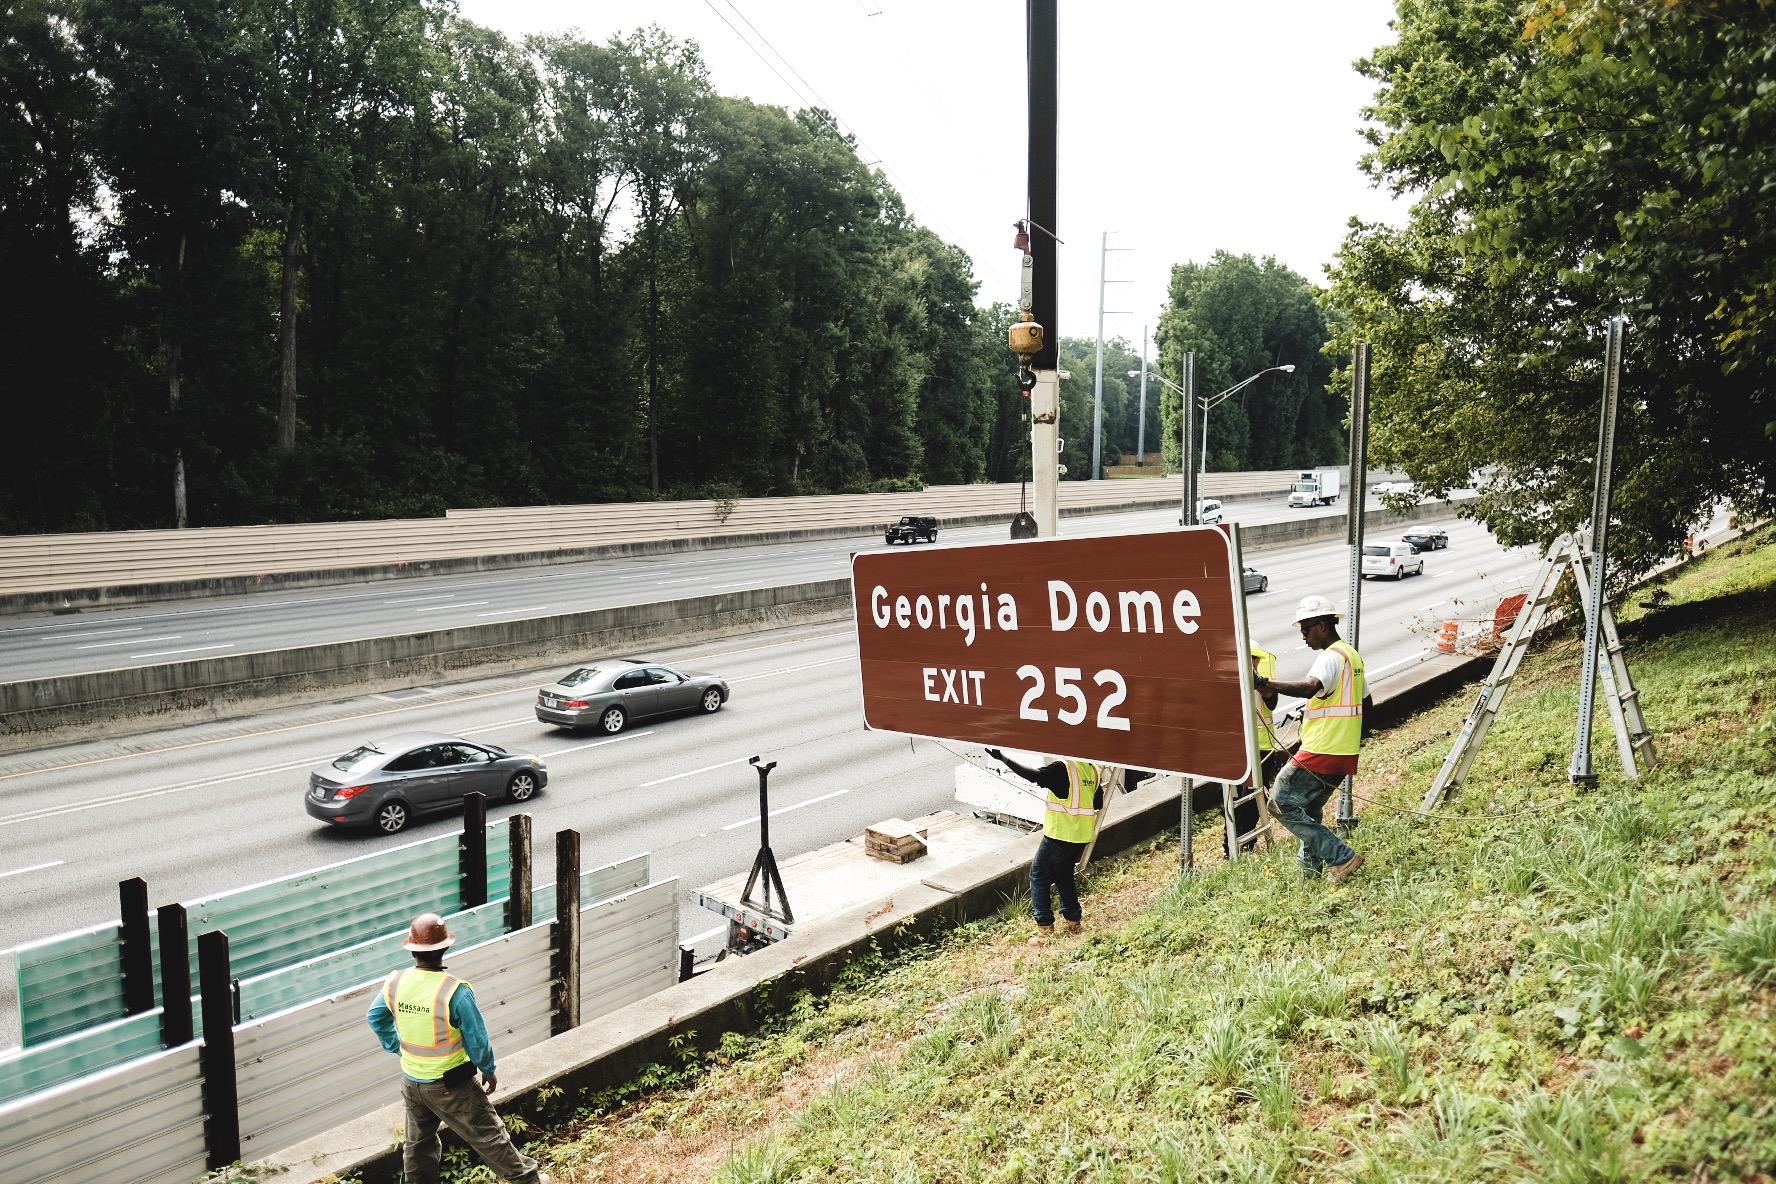 Georgia dome signs begin falling across atlanta for for Mercedes benz georgia dome